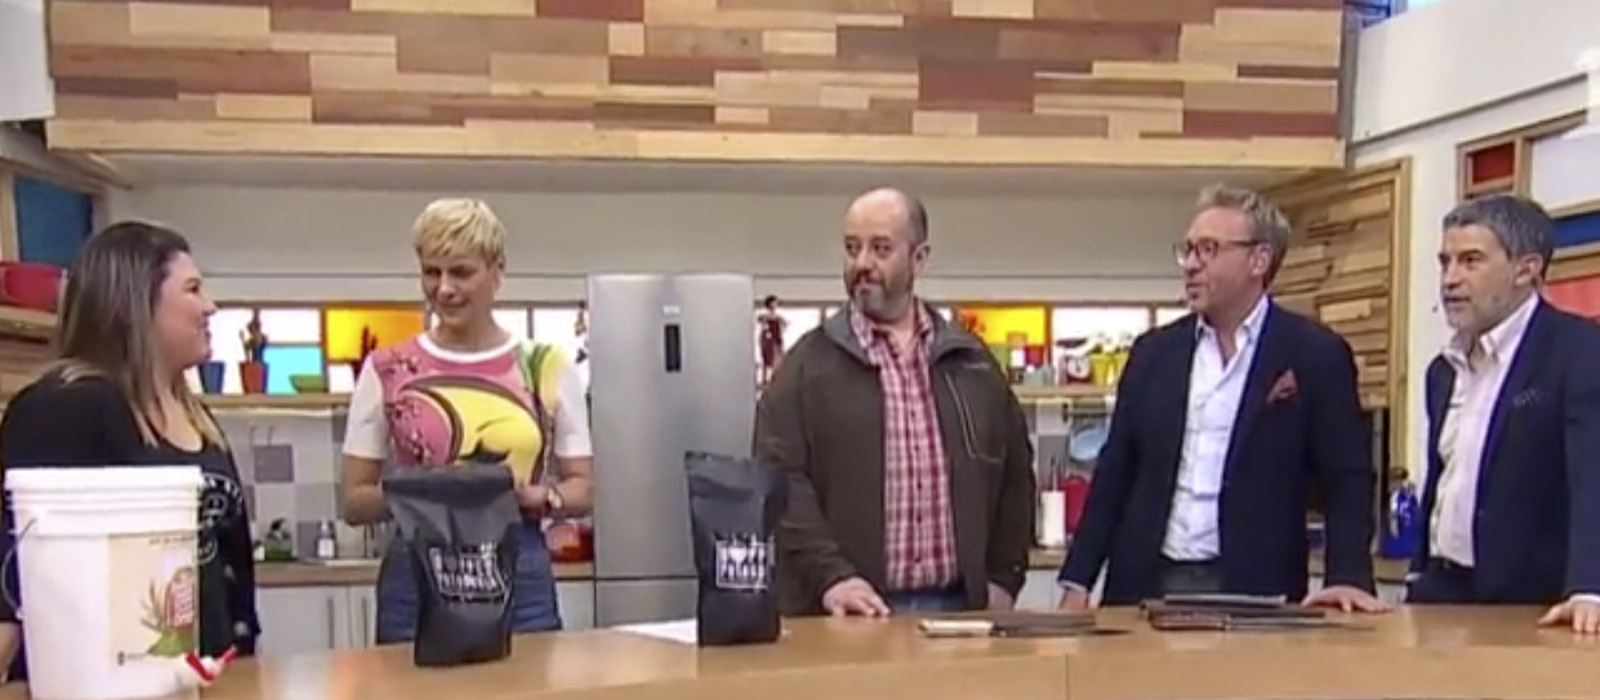 "Ganadores de Impulso Chileno visitan matinal ""Bienvenidos"" de Canal 13"